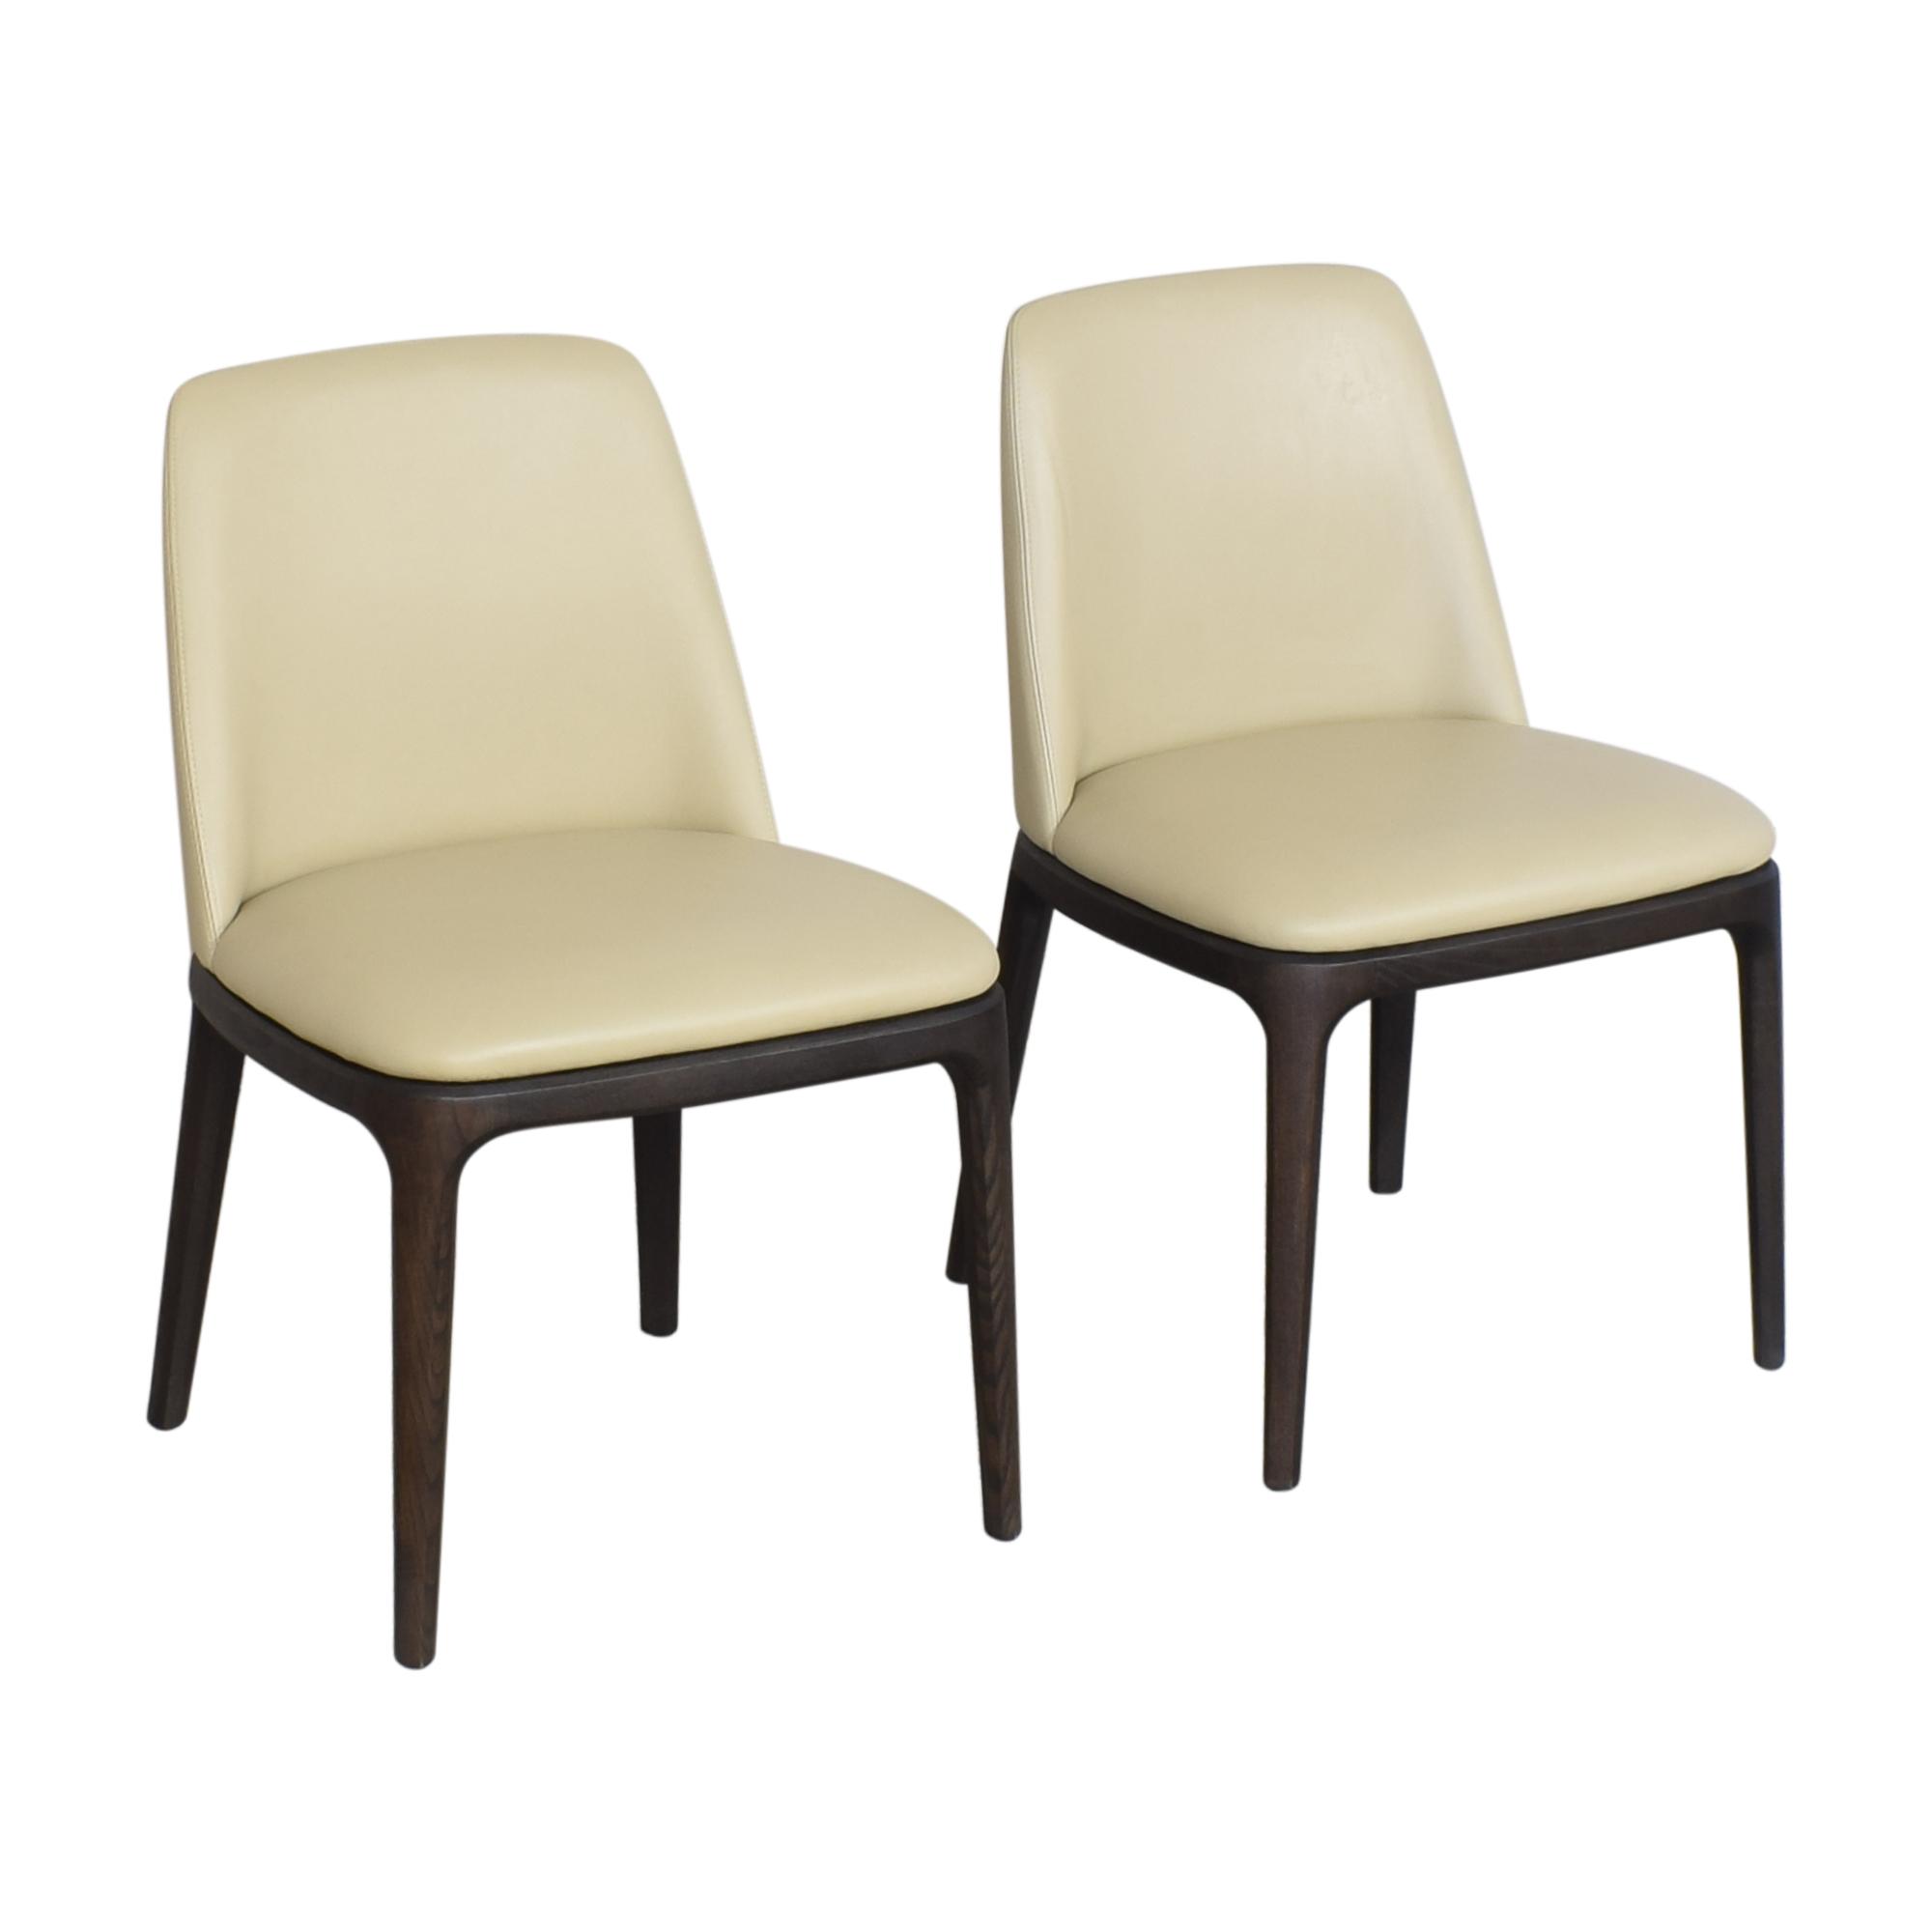 Poliform Poliform Grace Chairs second hand